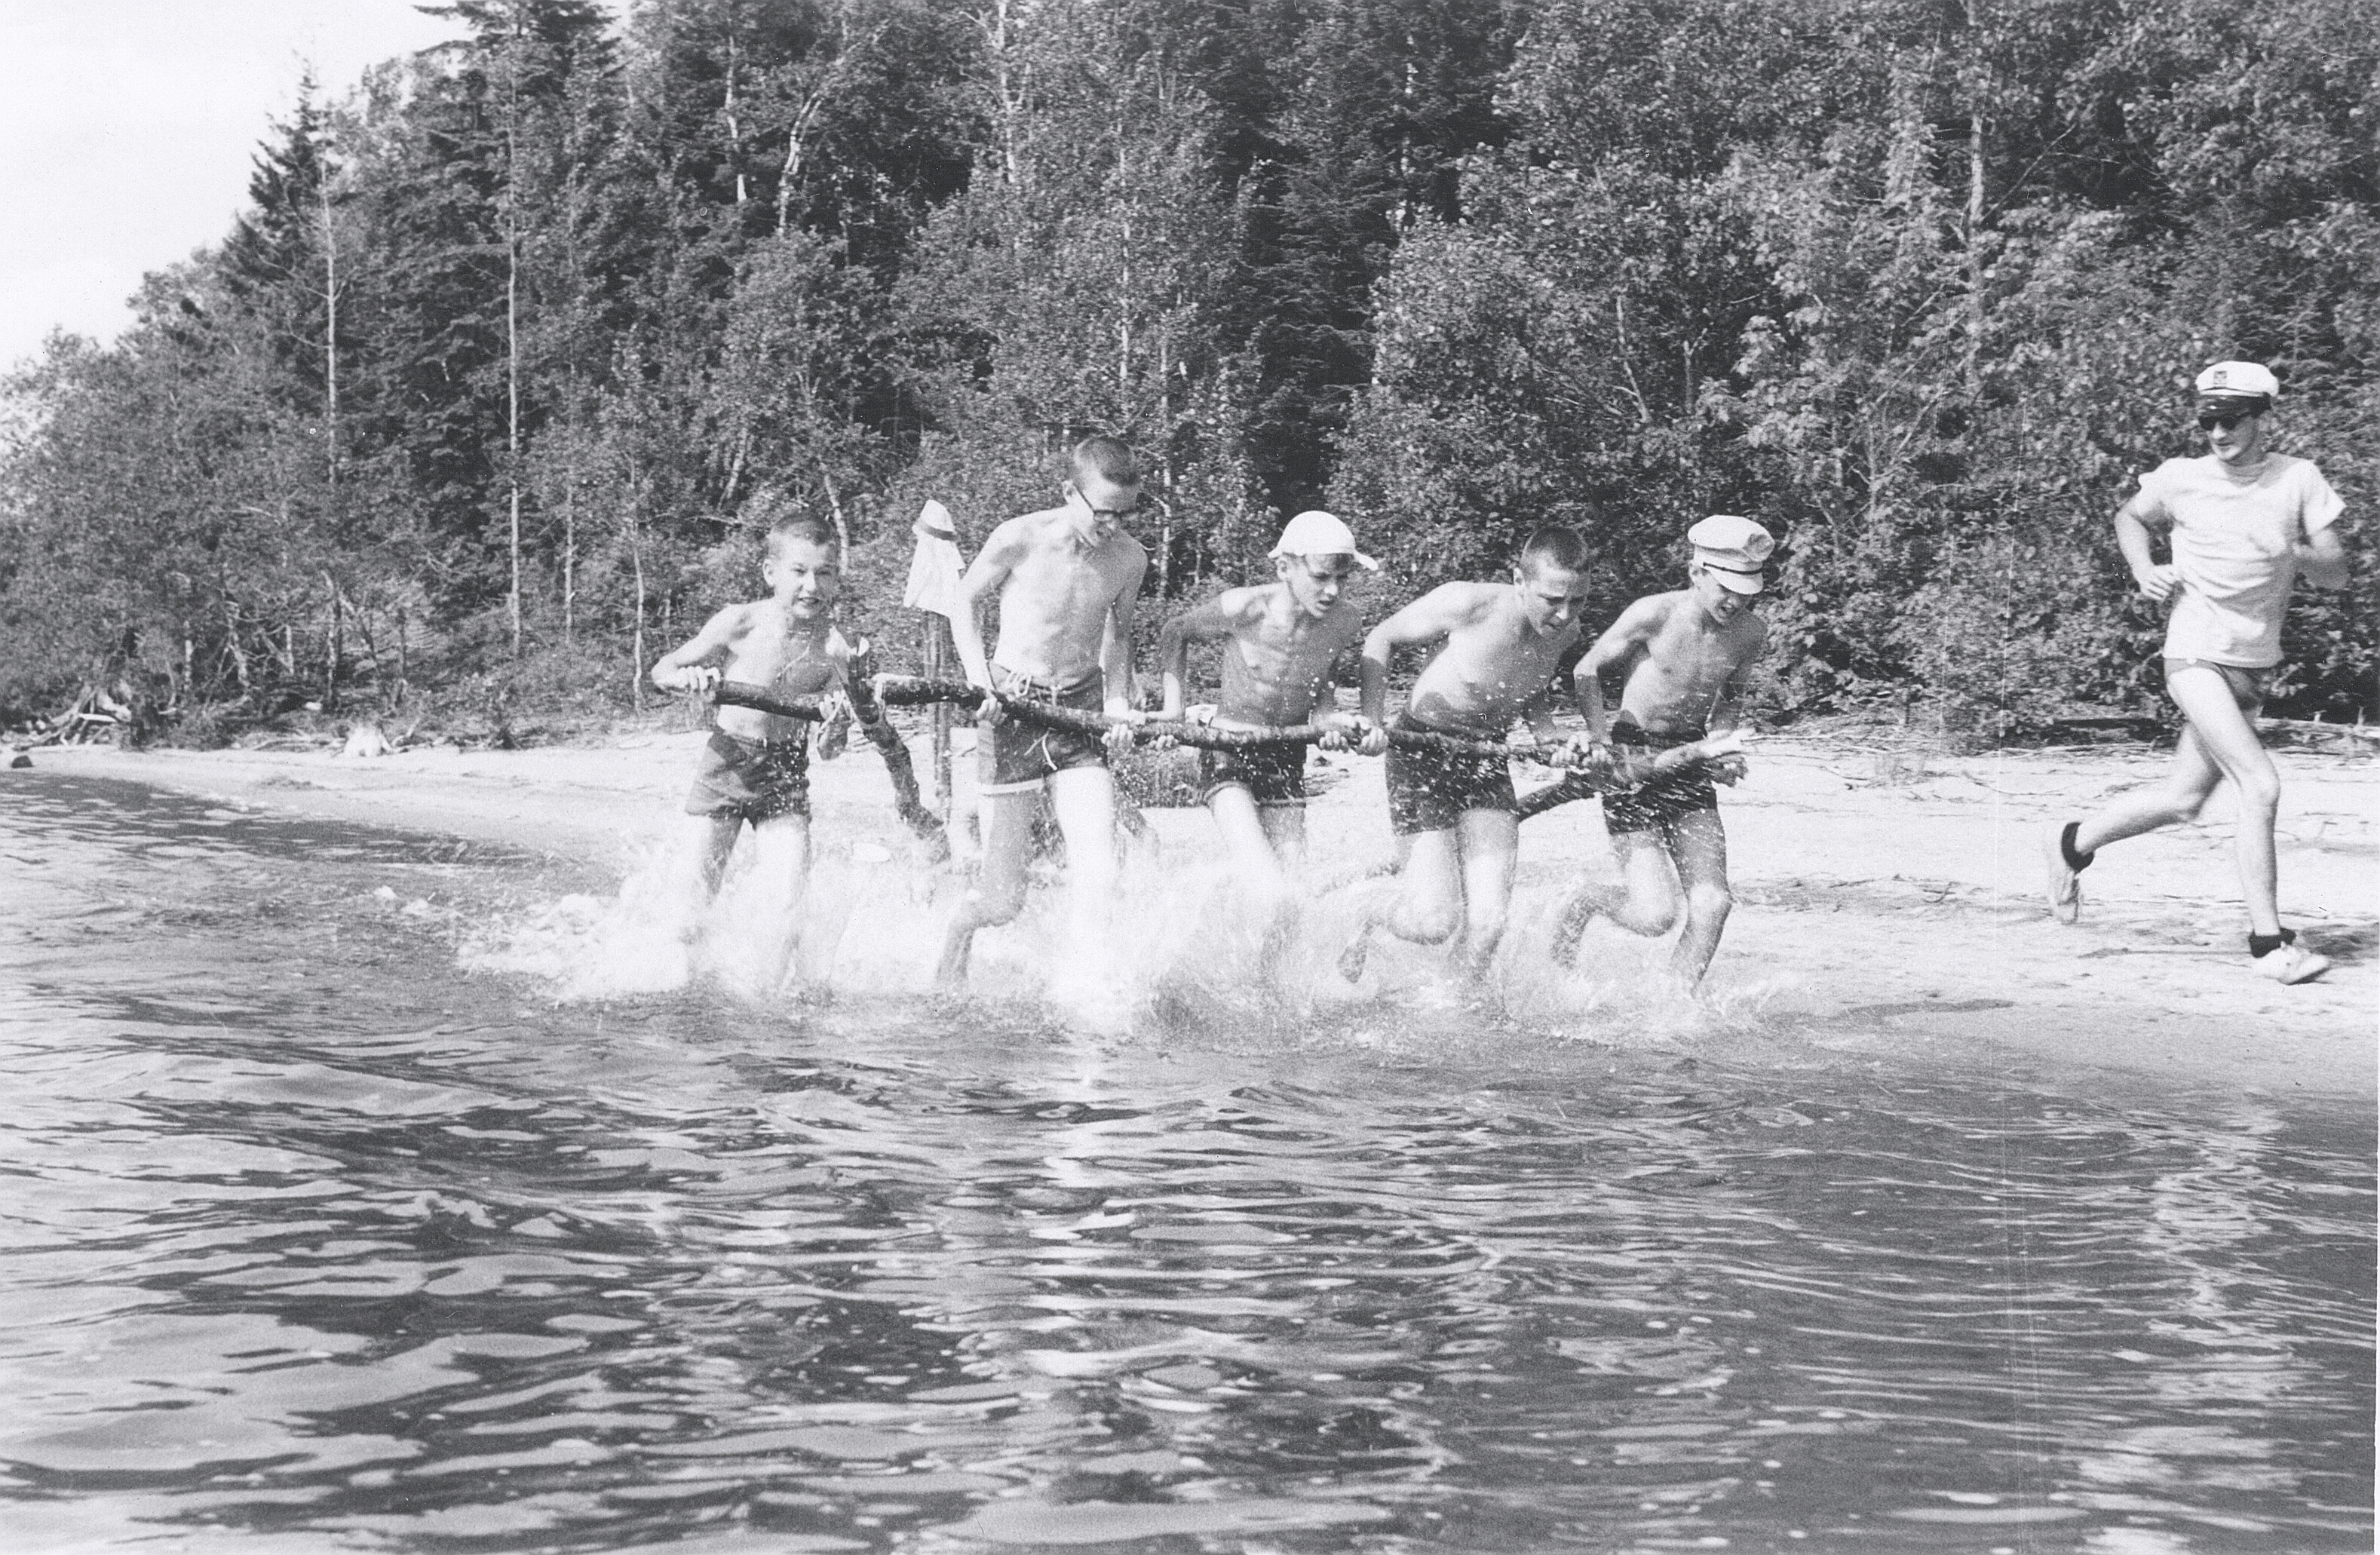 Les sorties en canot